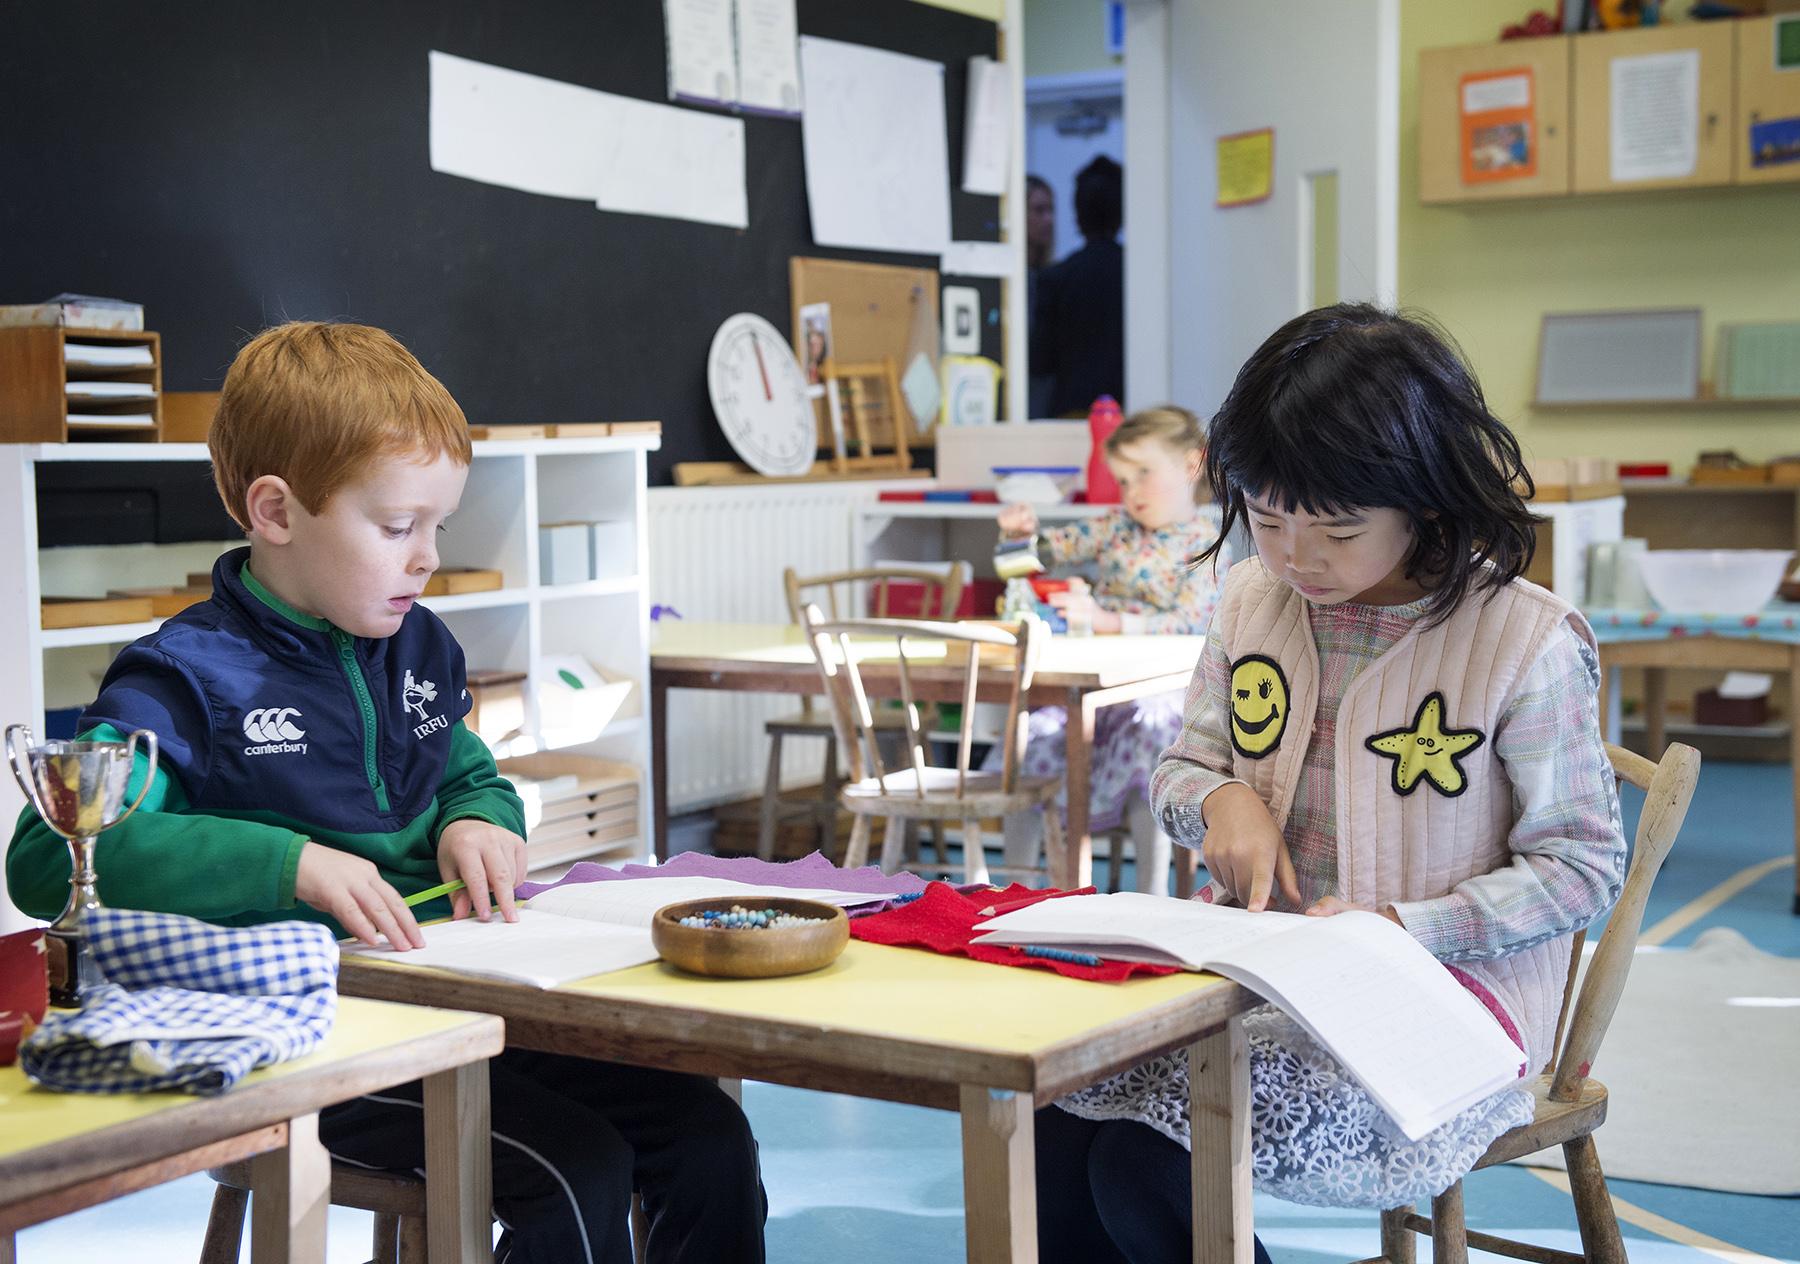 Montessori Primary School ages 3 to 6